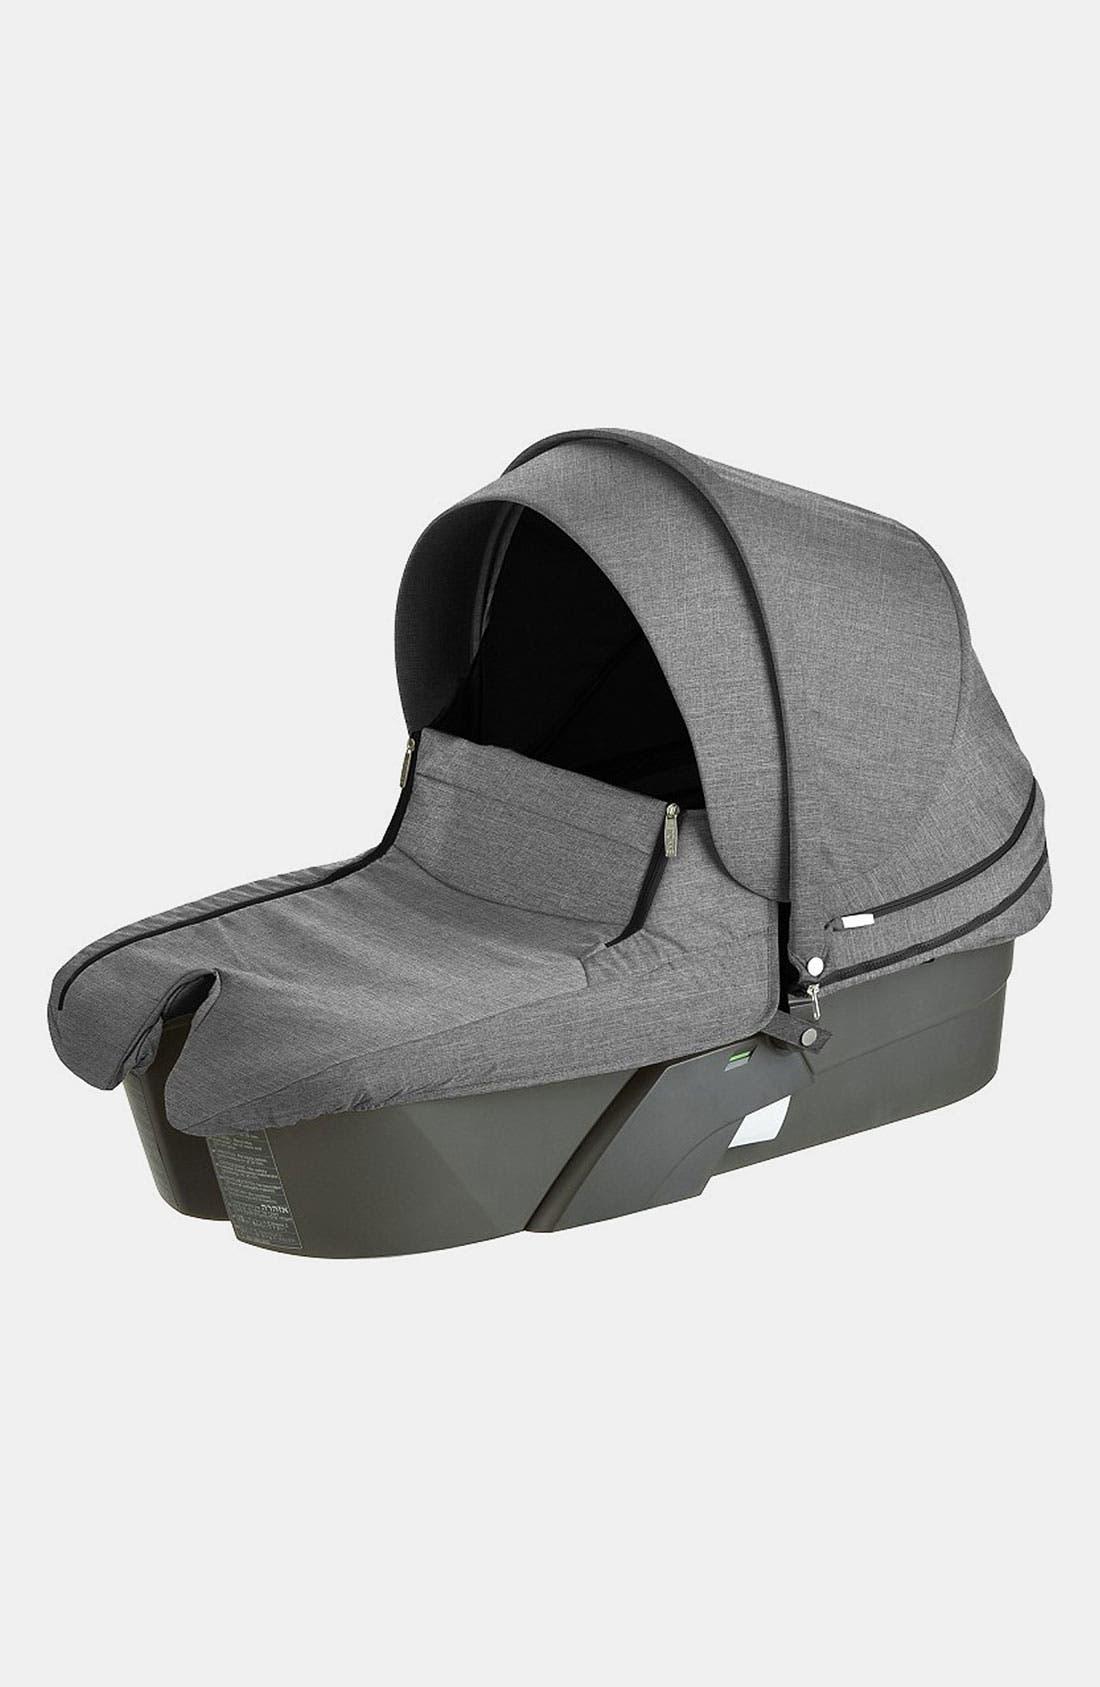 'Xplory<sup>®</sup>' Stroller Carry Cot,                         Main,                         color, Black Melange